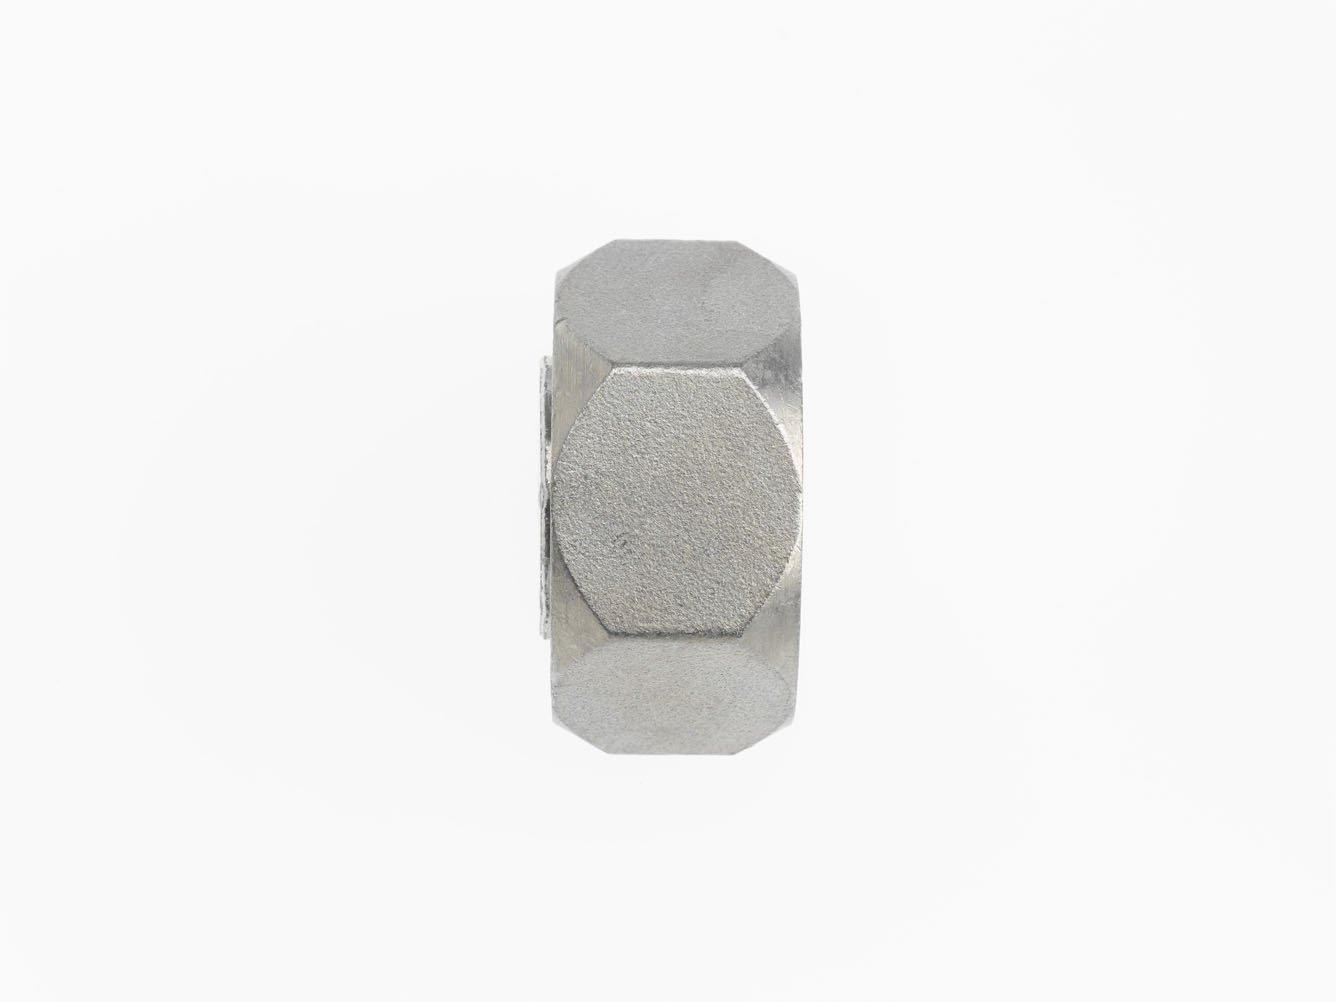 Brennan 0304-C-16 Steel JIC Flared Tube Fitting, Cap Nut, 1